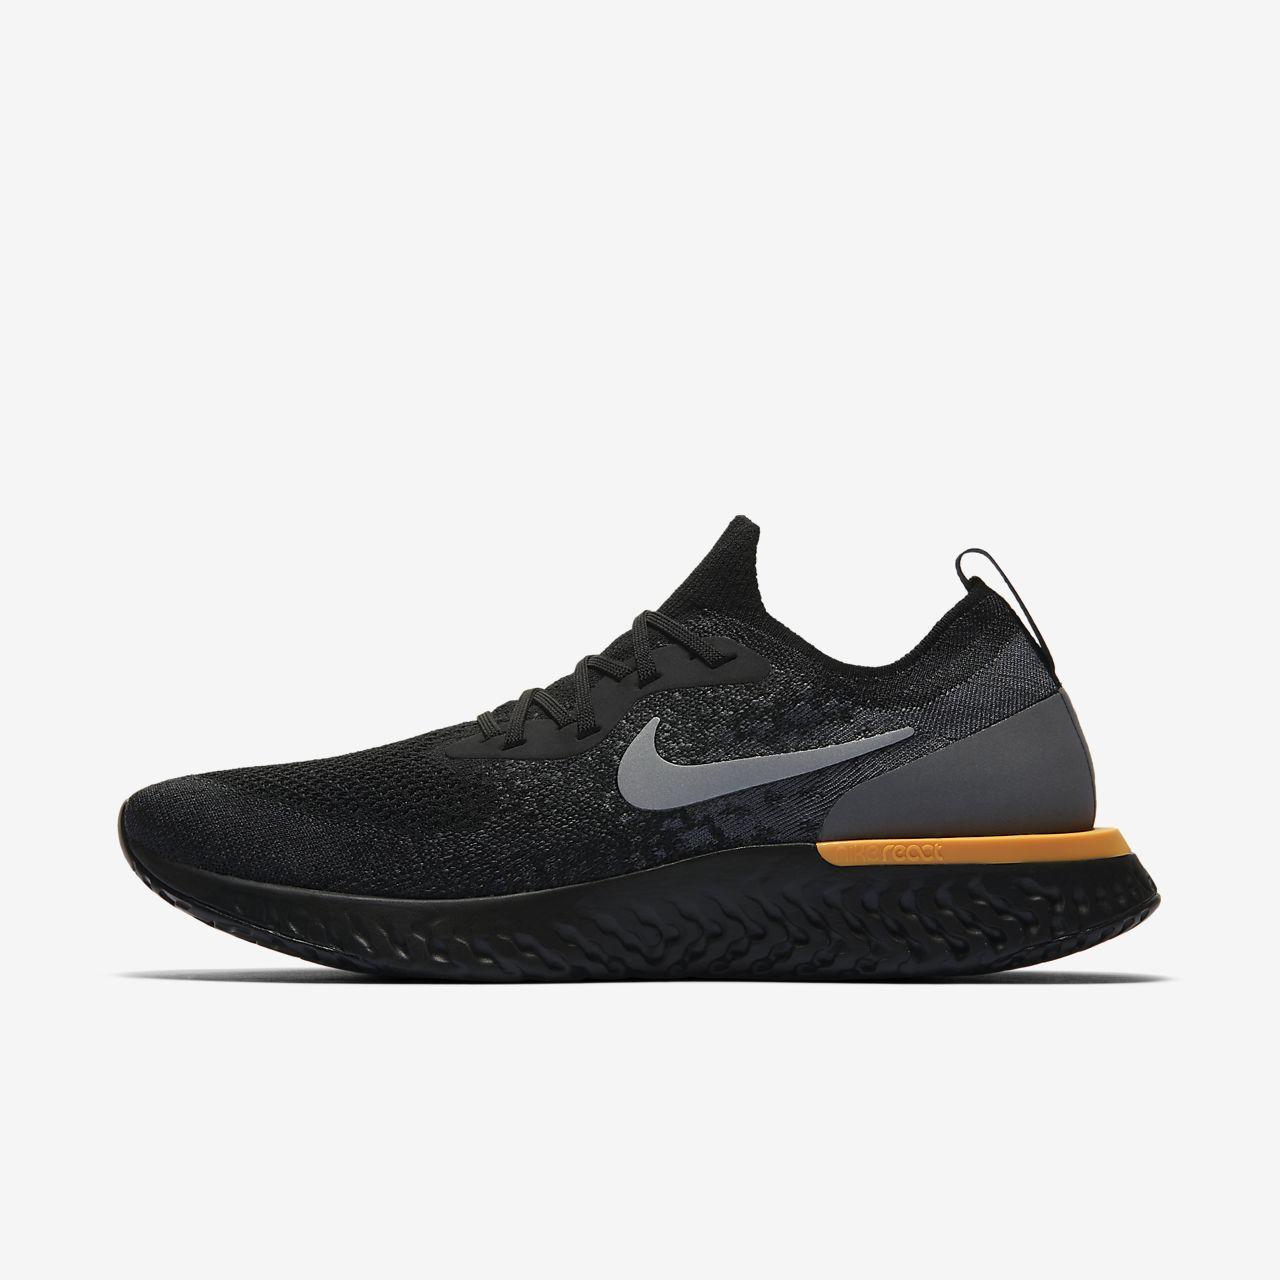 9488d031833d1 ... best price calzado de running para hombre nike epic react flyknit 7f9ef  426c6